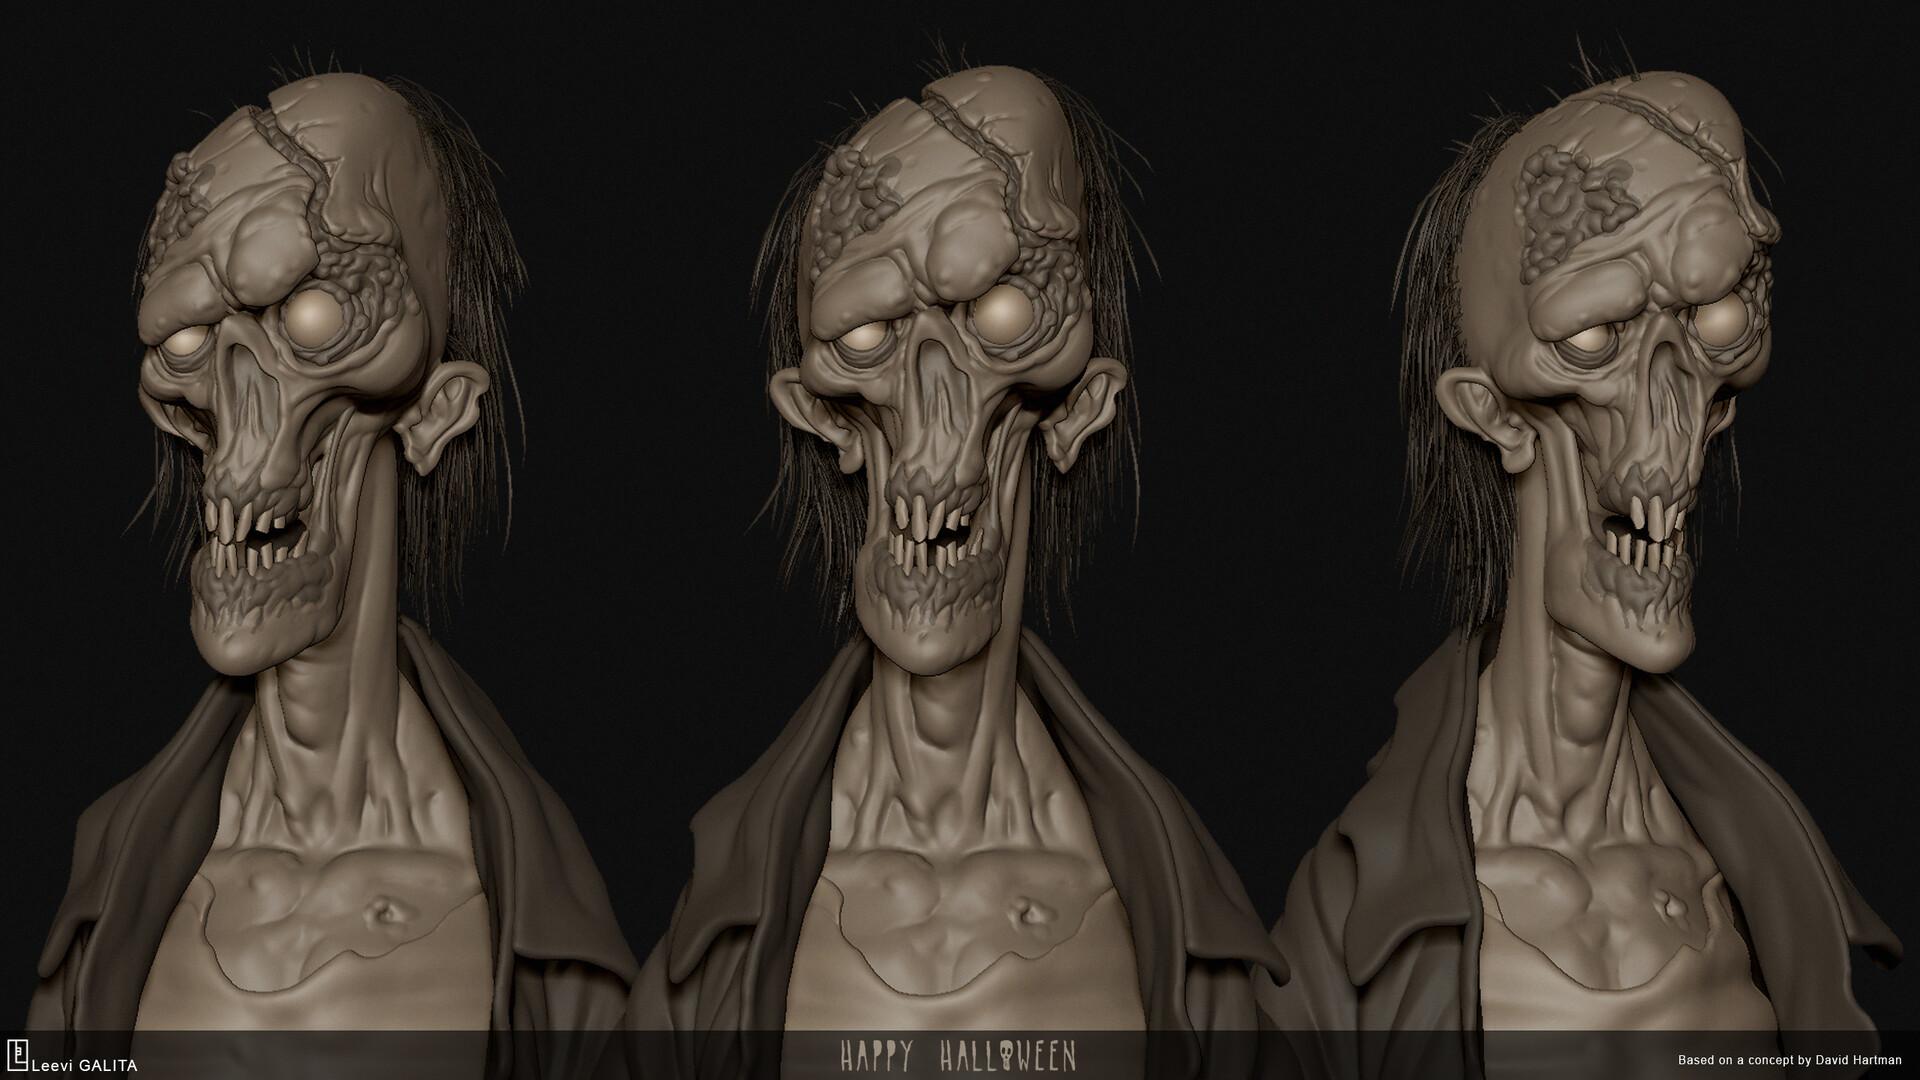 Leevi galita zombiesculpt